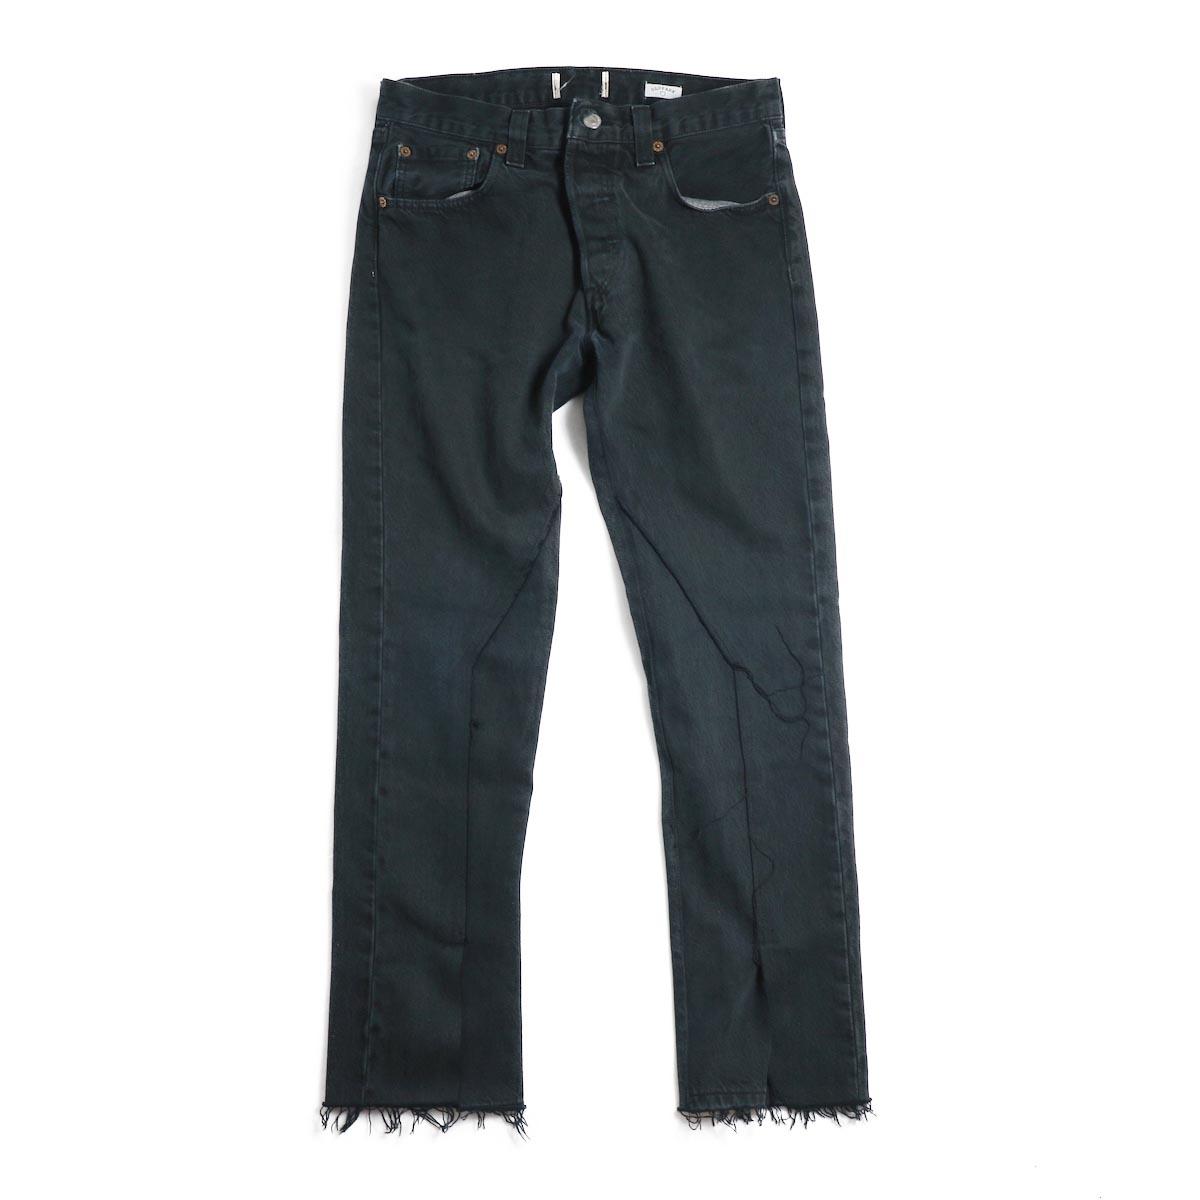 OLD PARK / Slit Jeans -Black Ssize(G)